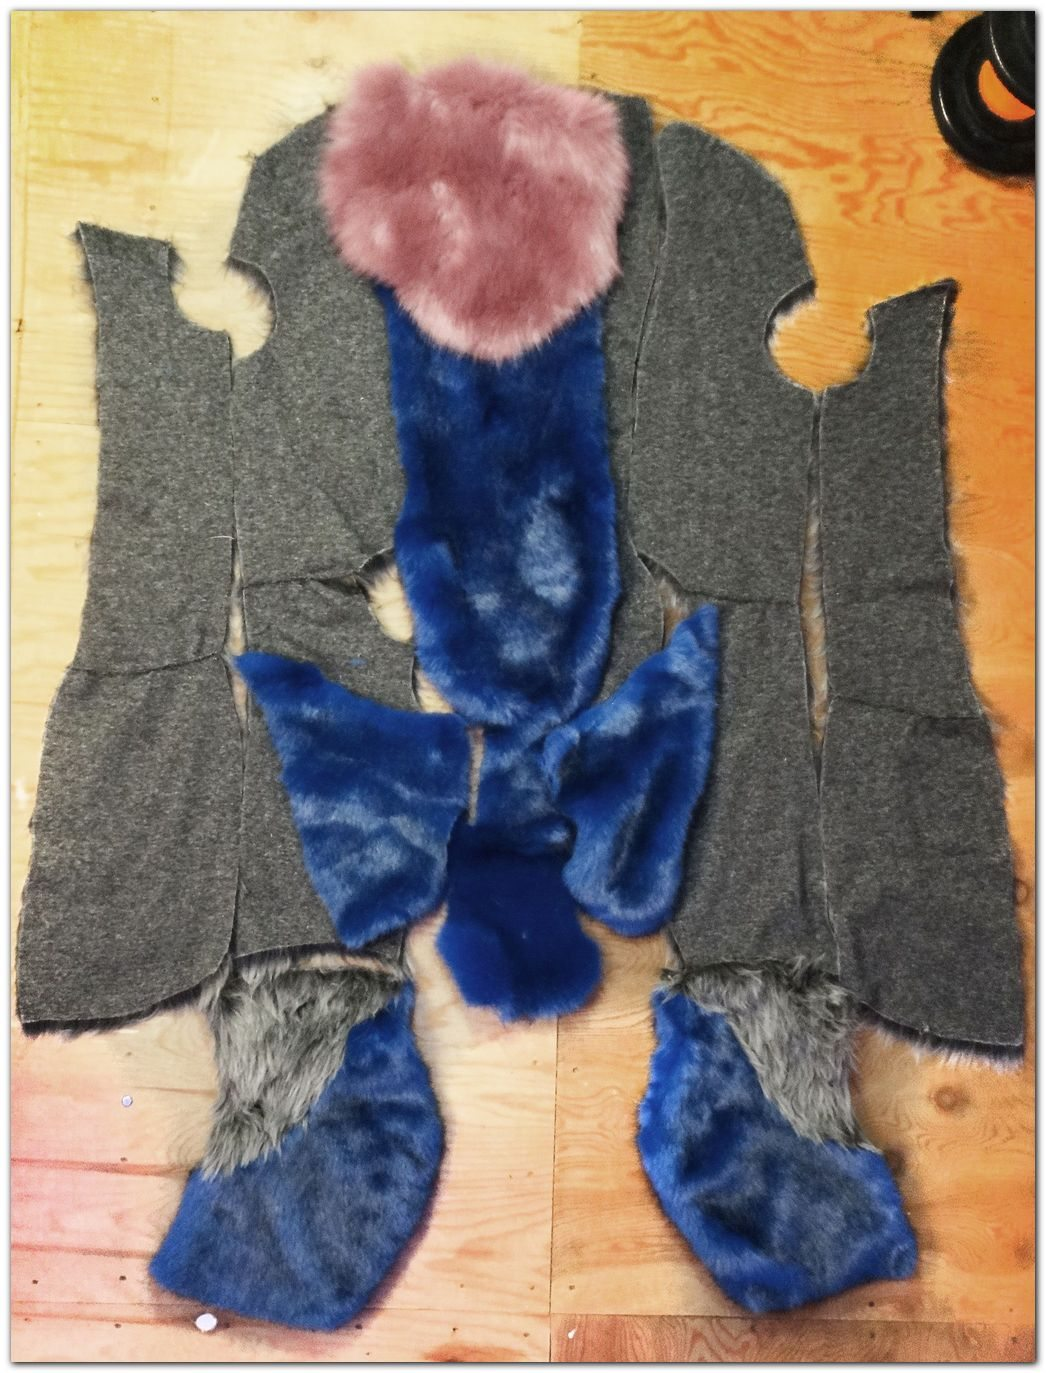 #fursuits jumpsuit #furr.club #fursuit Koomoe